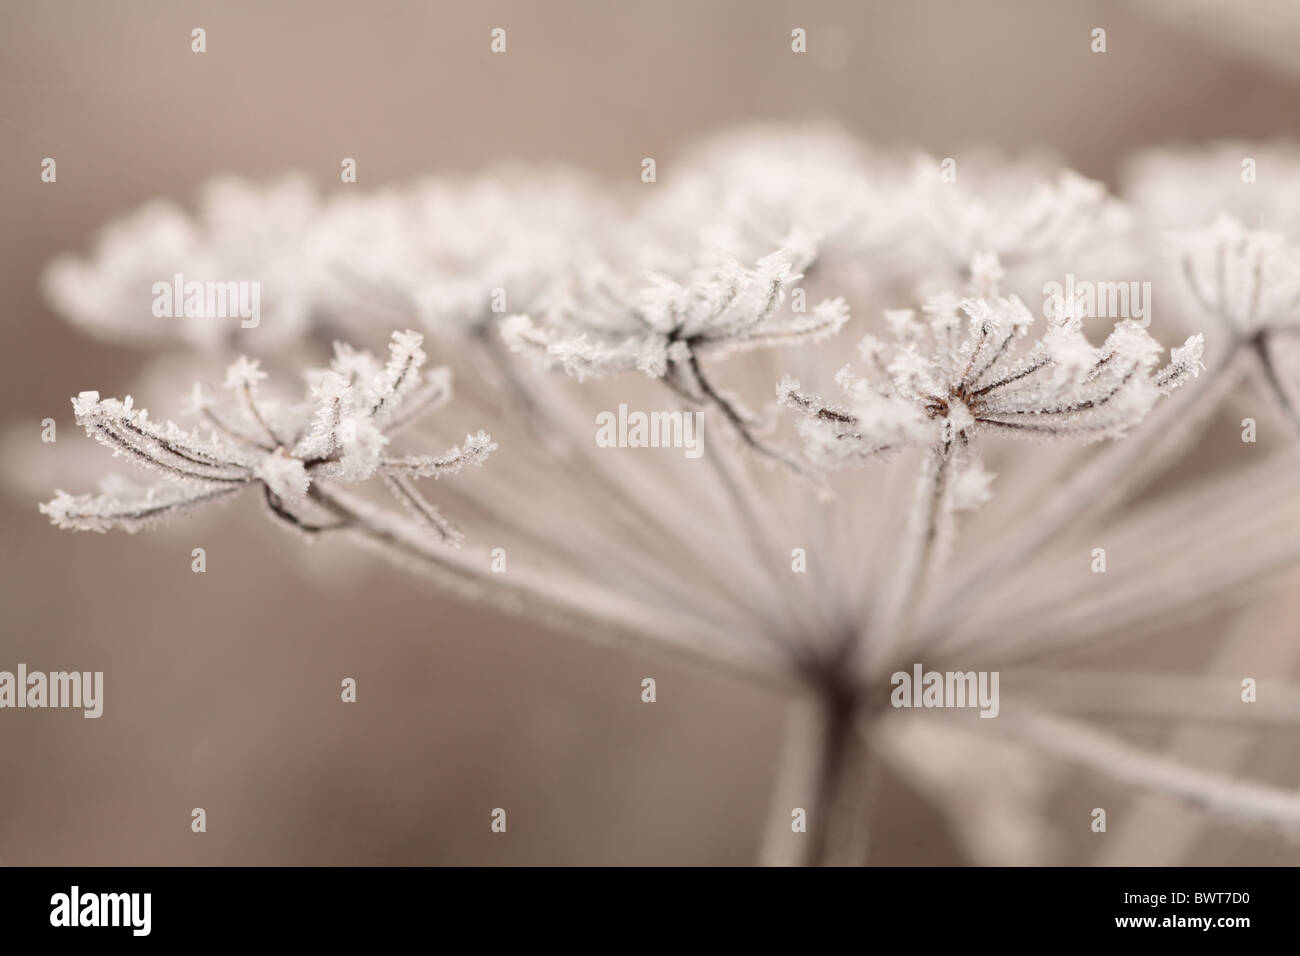 Angelica sylvestris nature sauvage de la faune de l'environnement l'environnement naturel de l'Europe Photo Stock